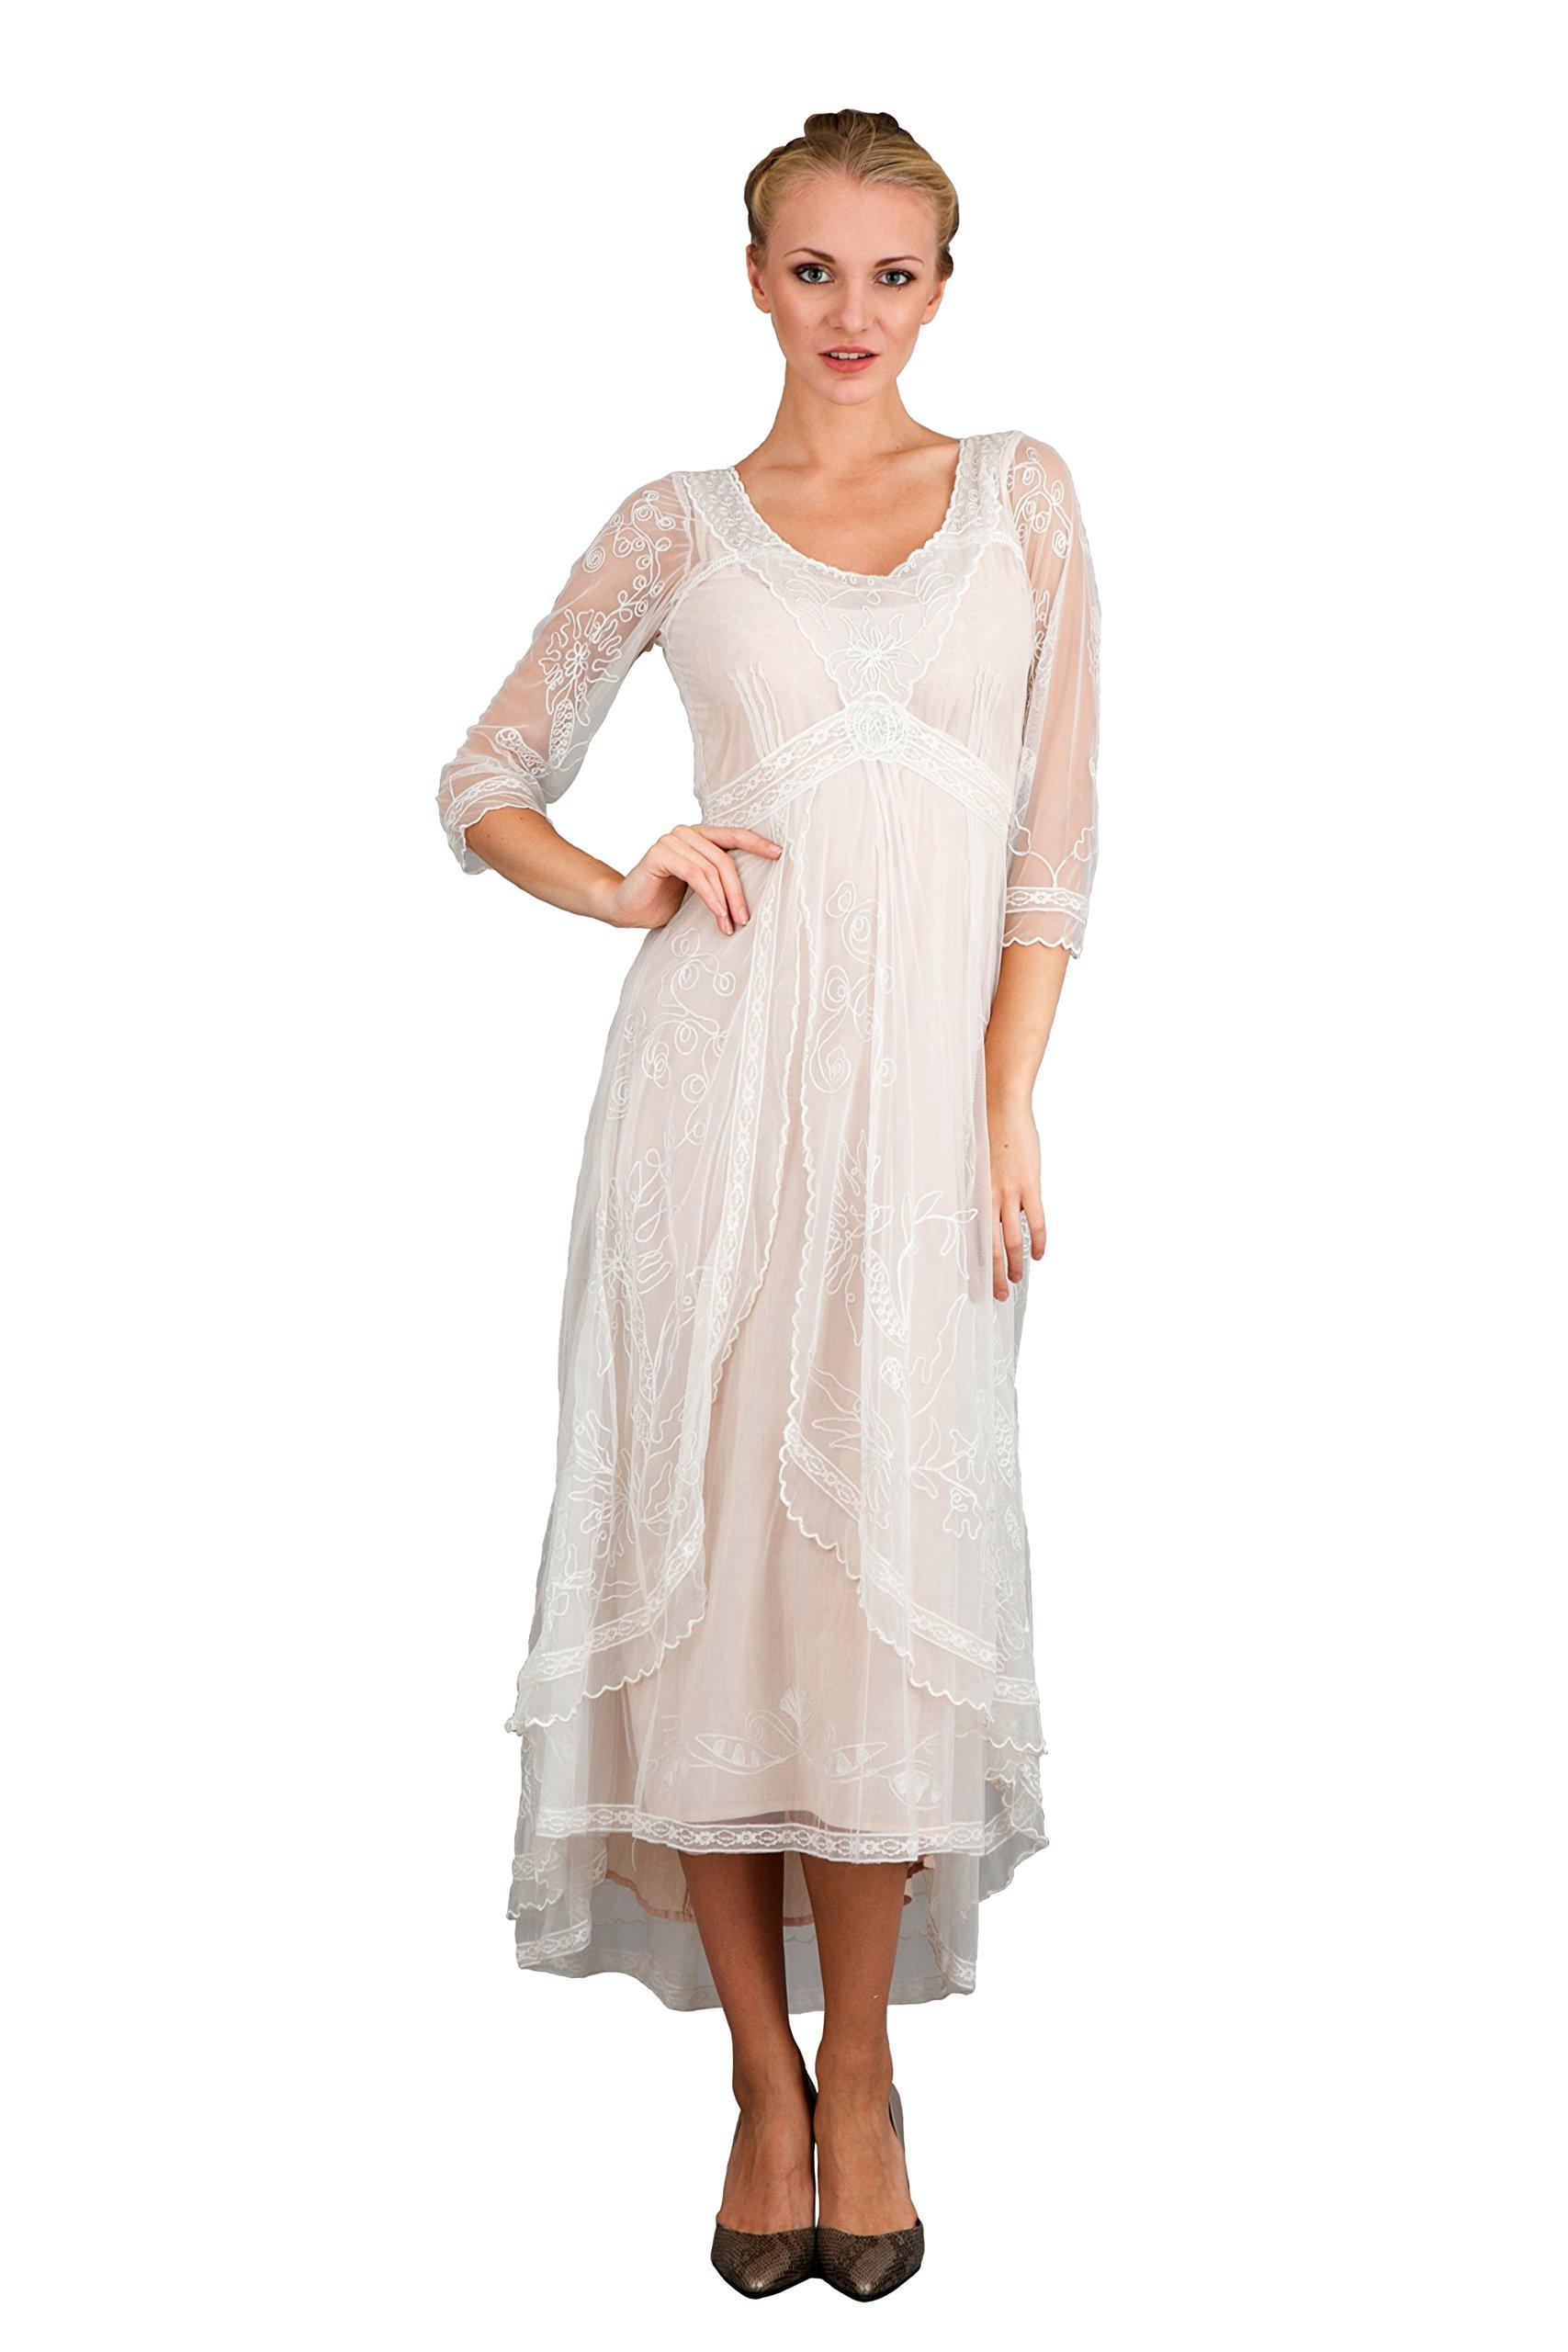 Nataya 40163 Women's Downton Abbey Style Wedding Gown in Ivory/Peach (Medium) by Nataya